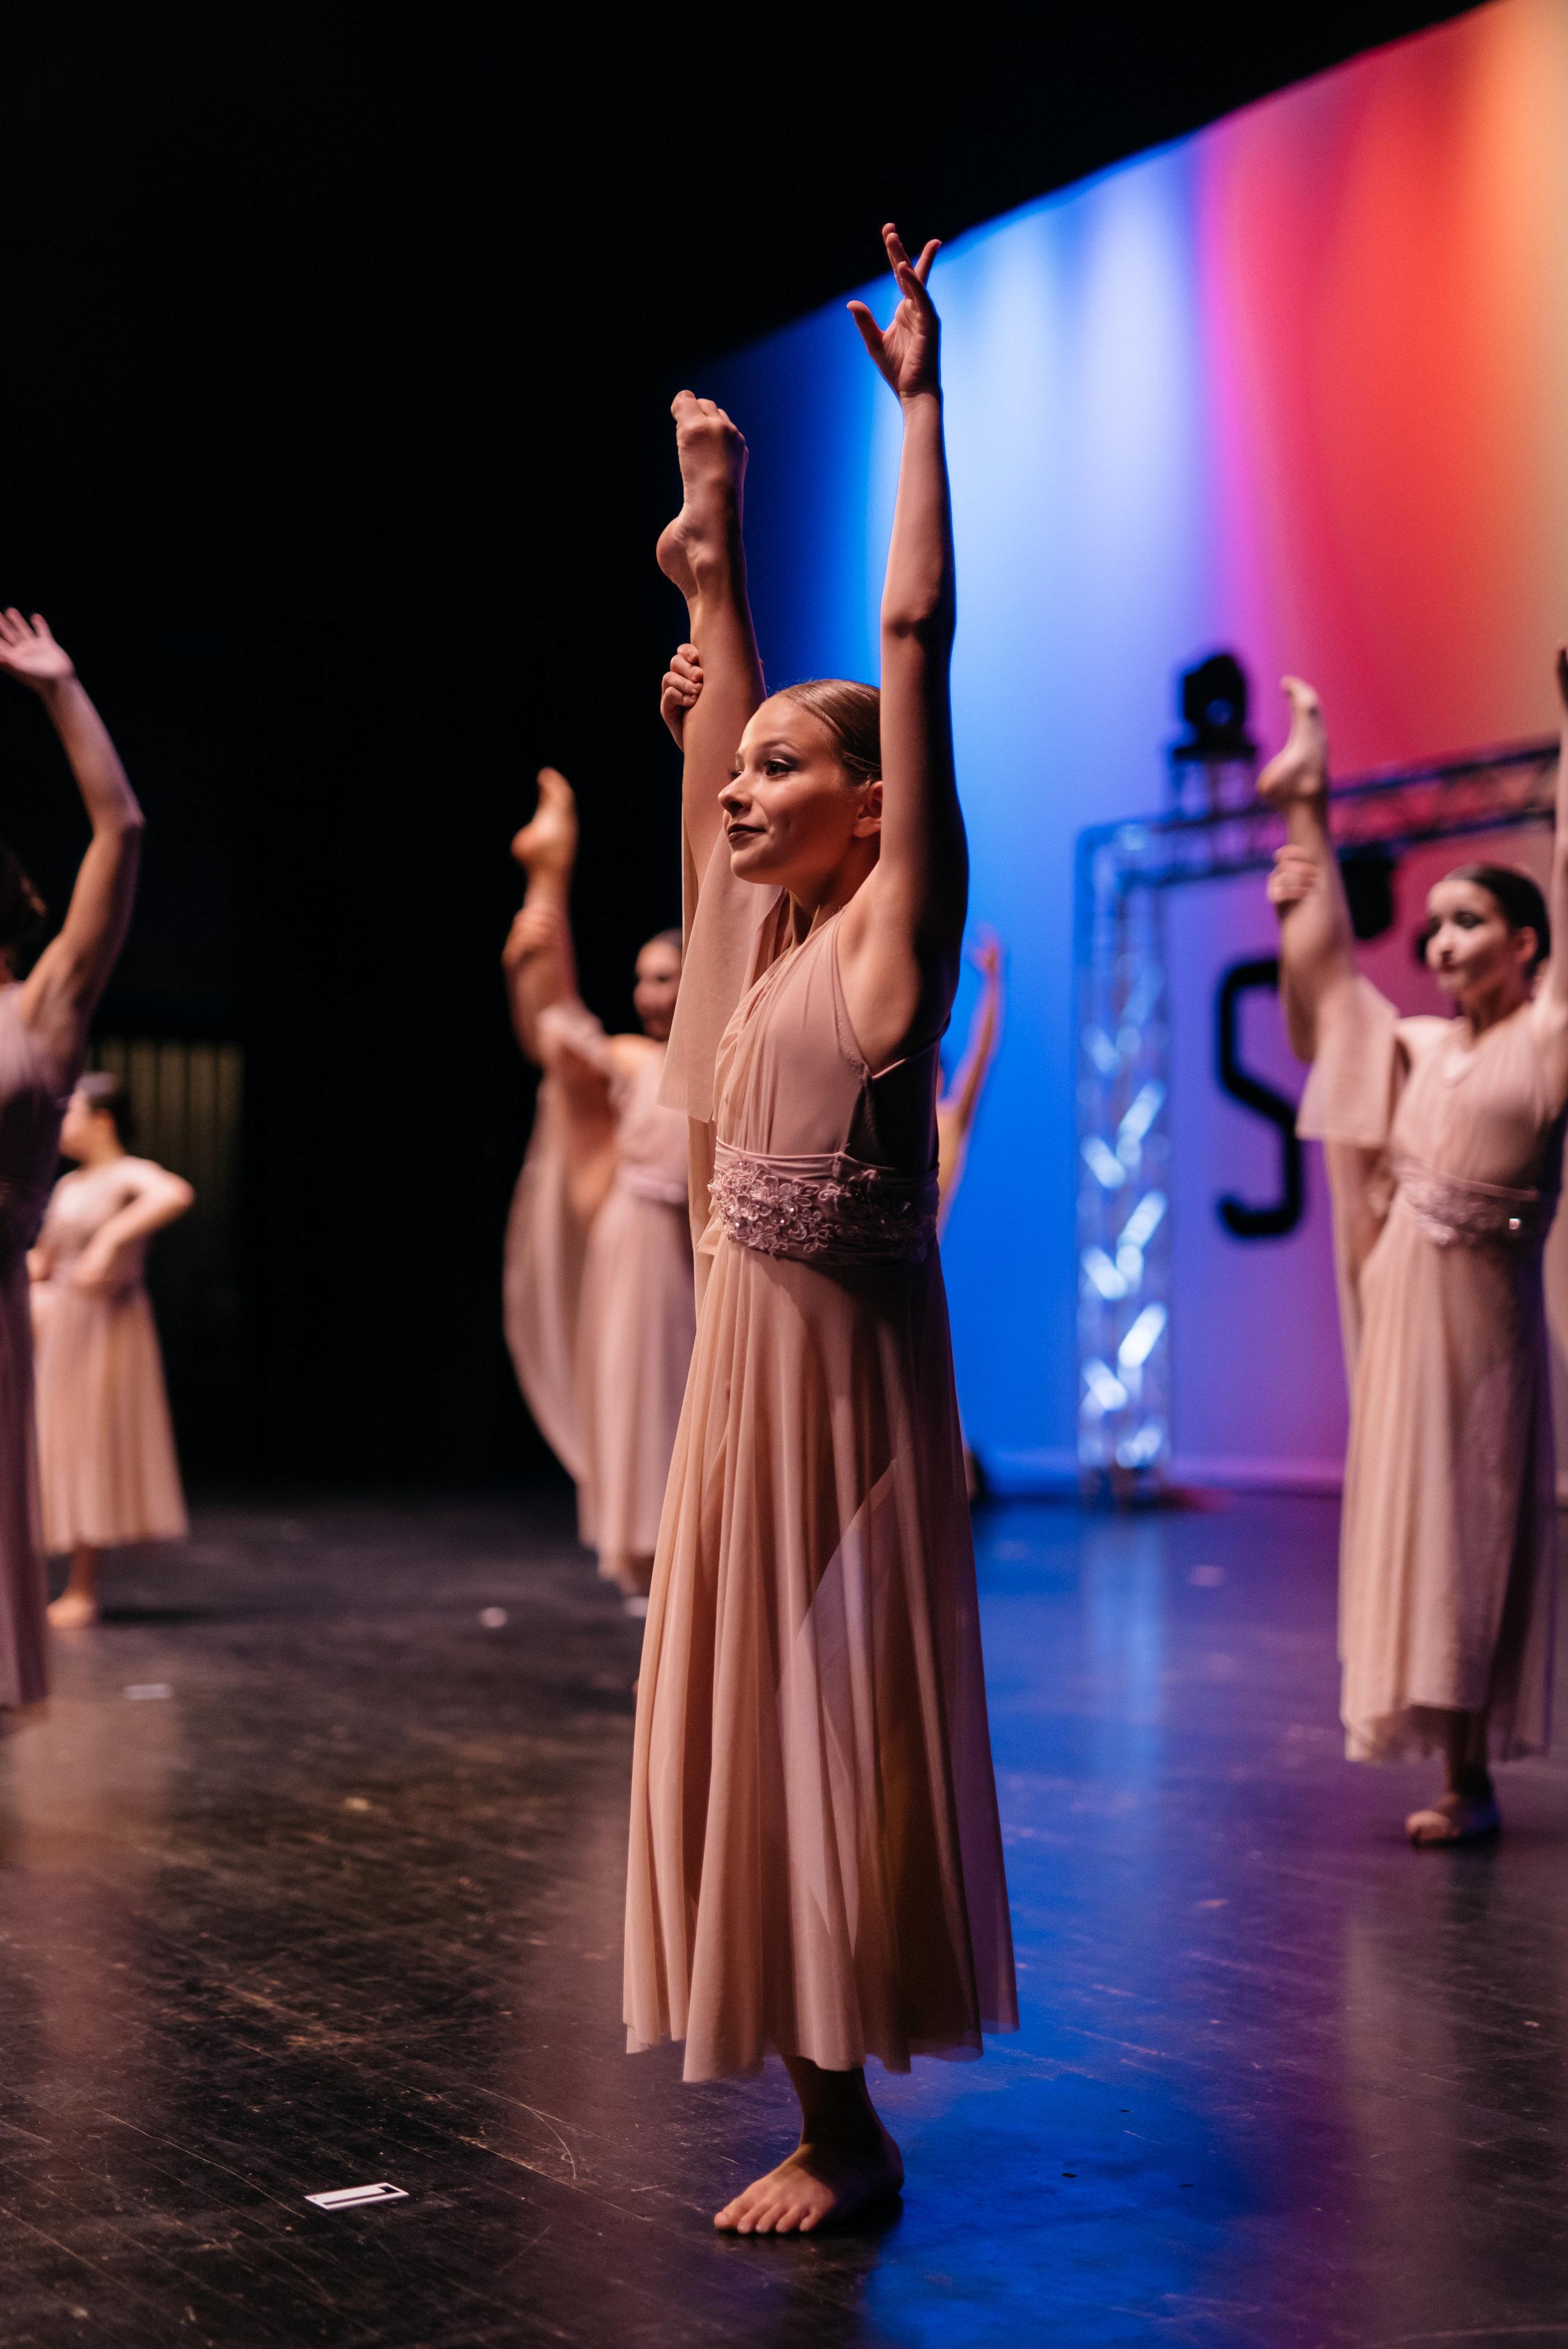 Steps N Concert Steps N Motion Dance Recital 2018-Saturday Show 2-0031.jpg